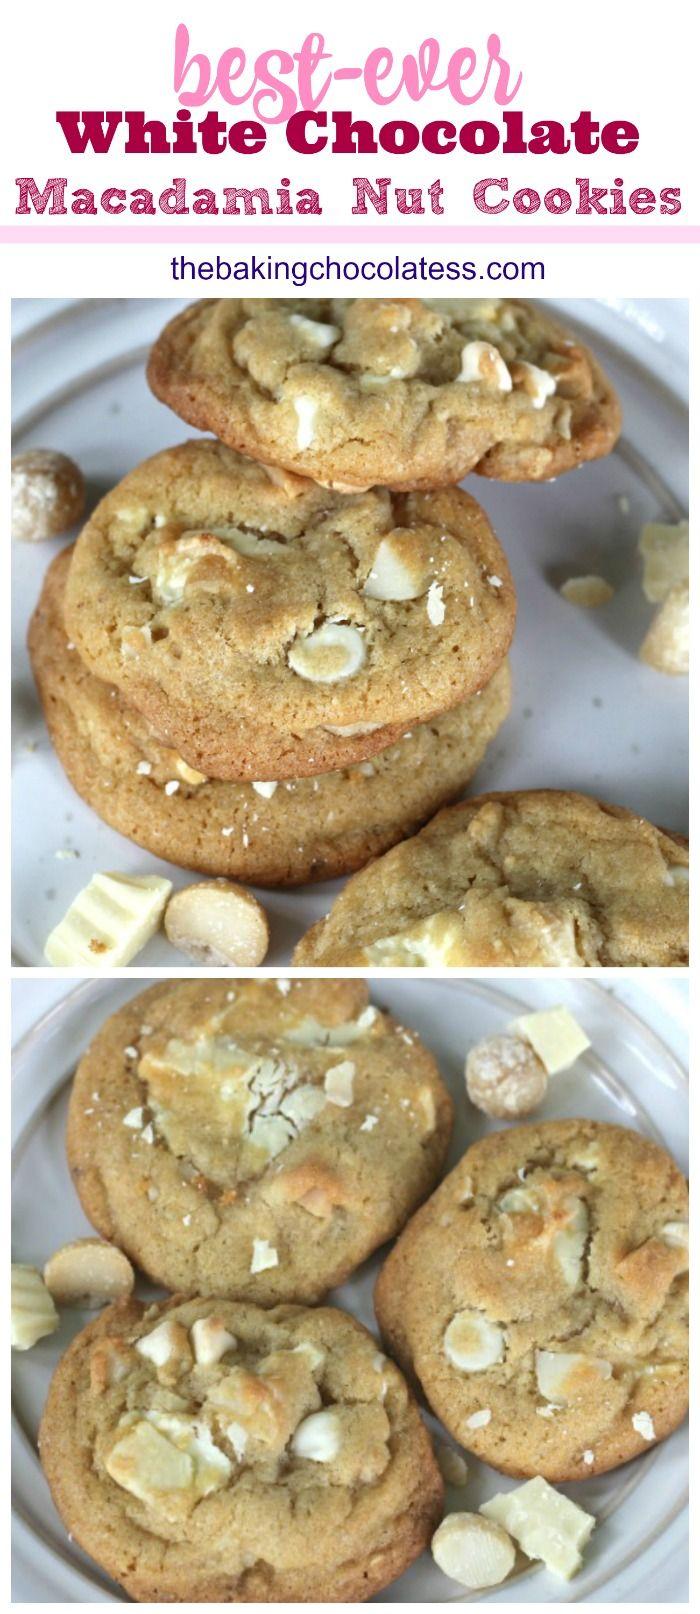 Best-Ever White Chocolate Macadamia Nut Cookies -…